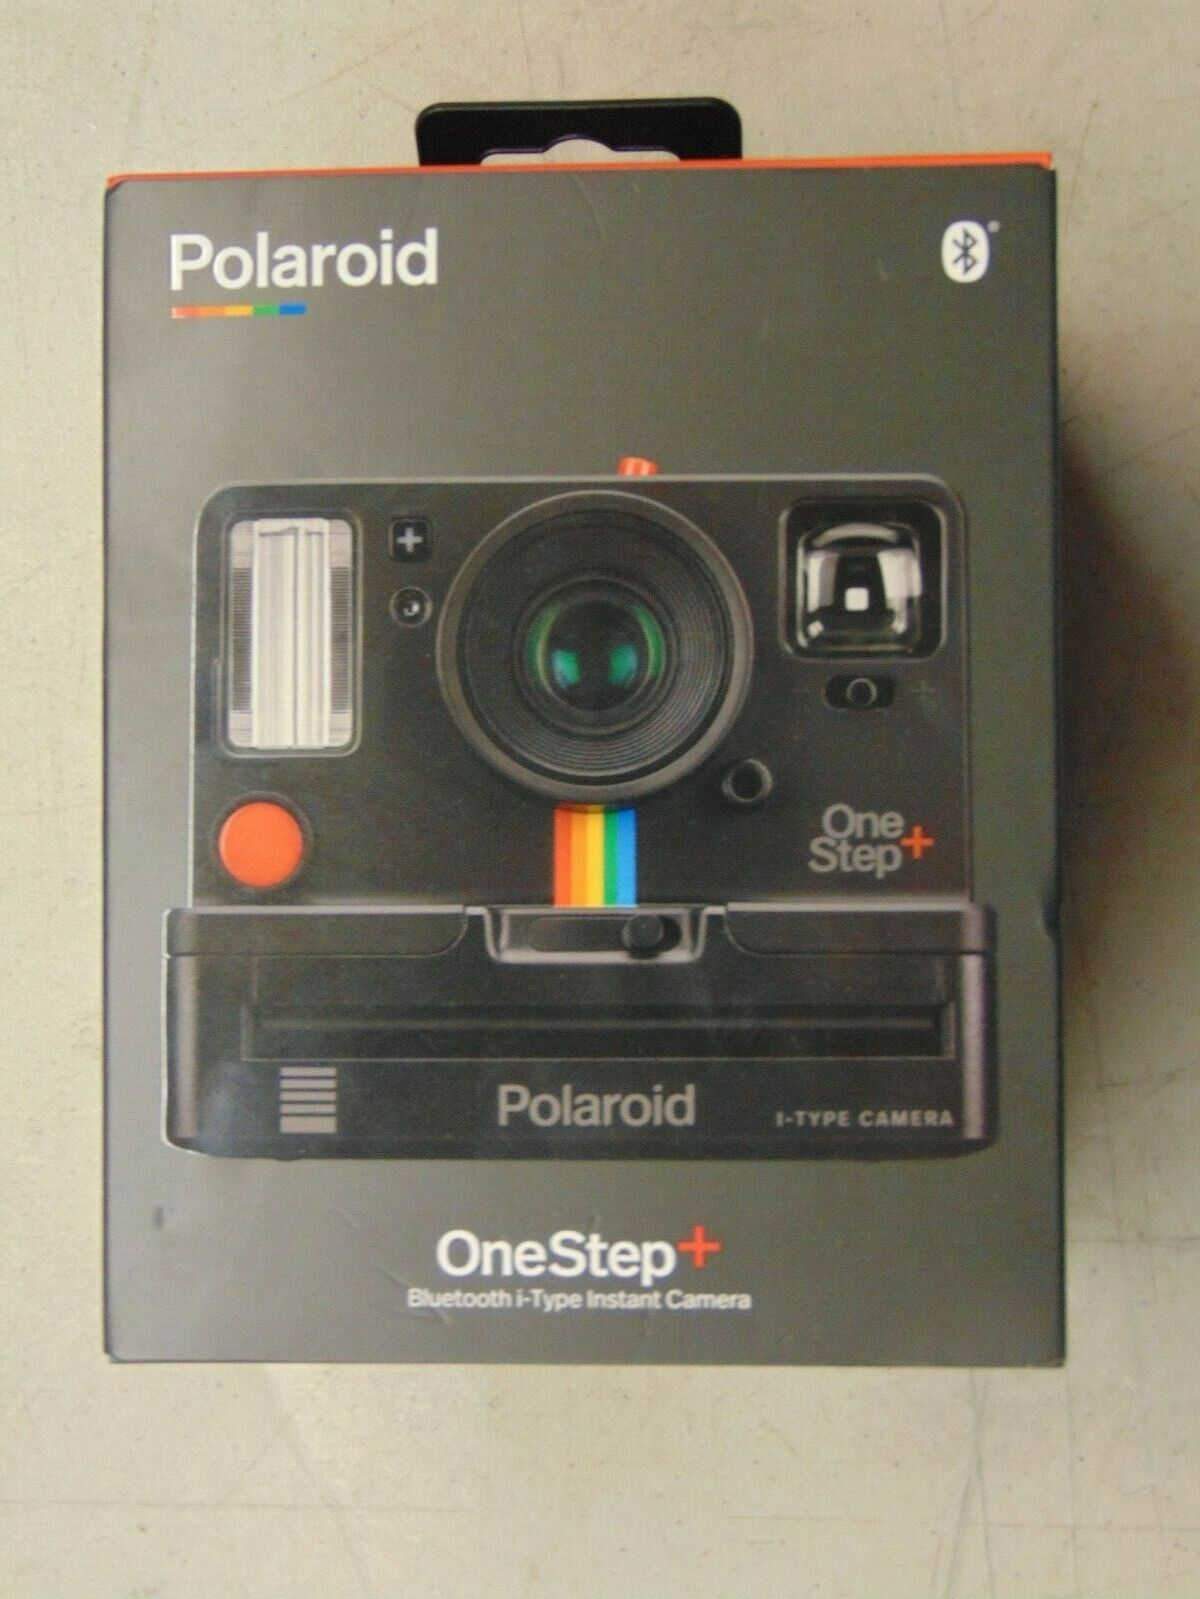 Polaroid Originals 9010 OneStep+ i-Type Camera -New/Sealed-